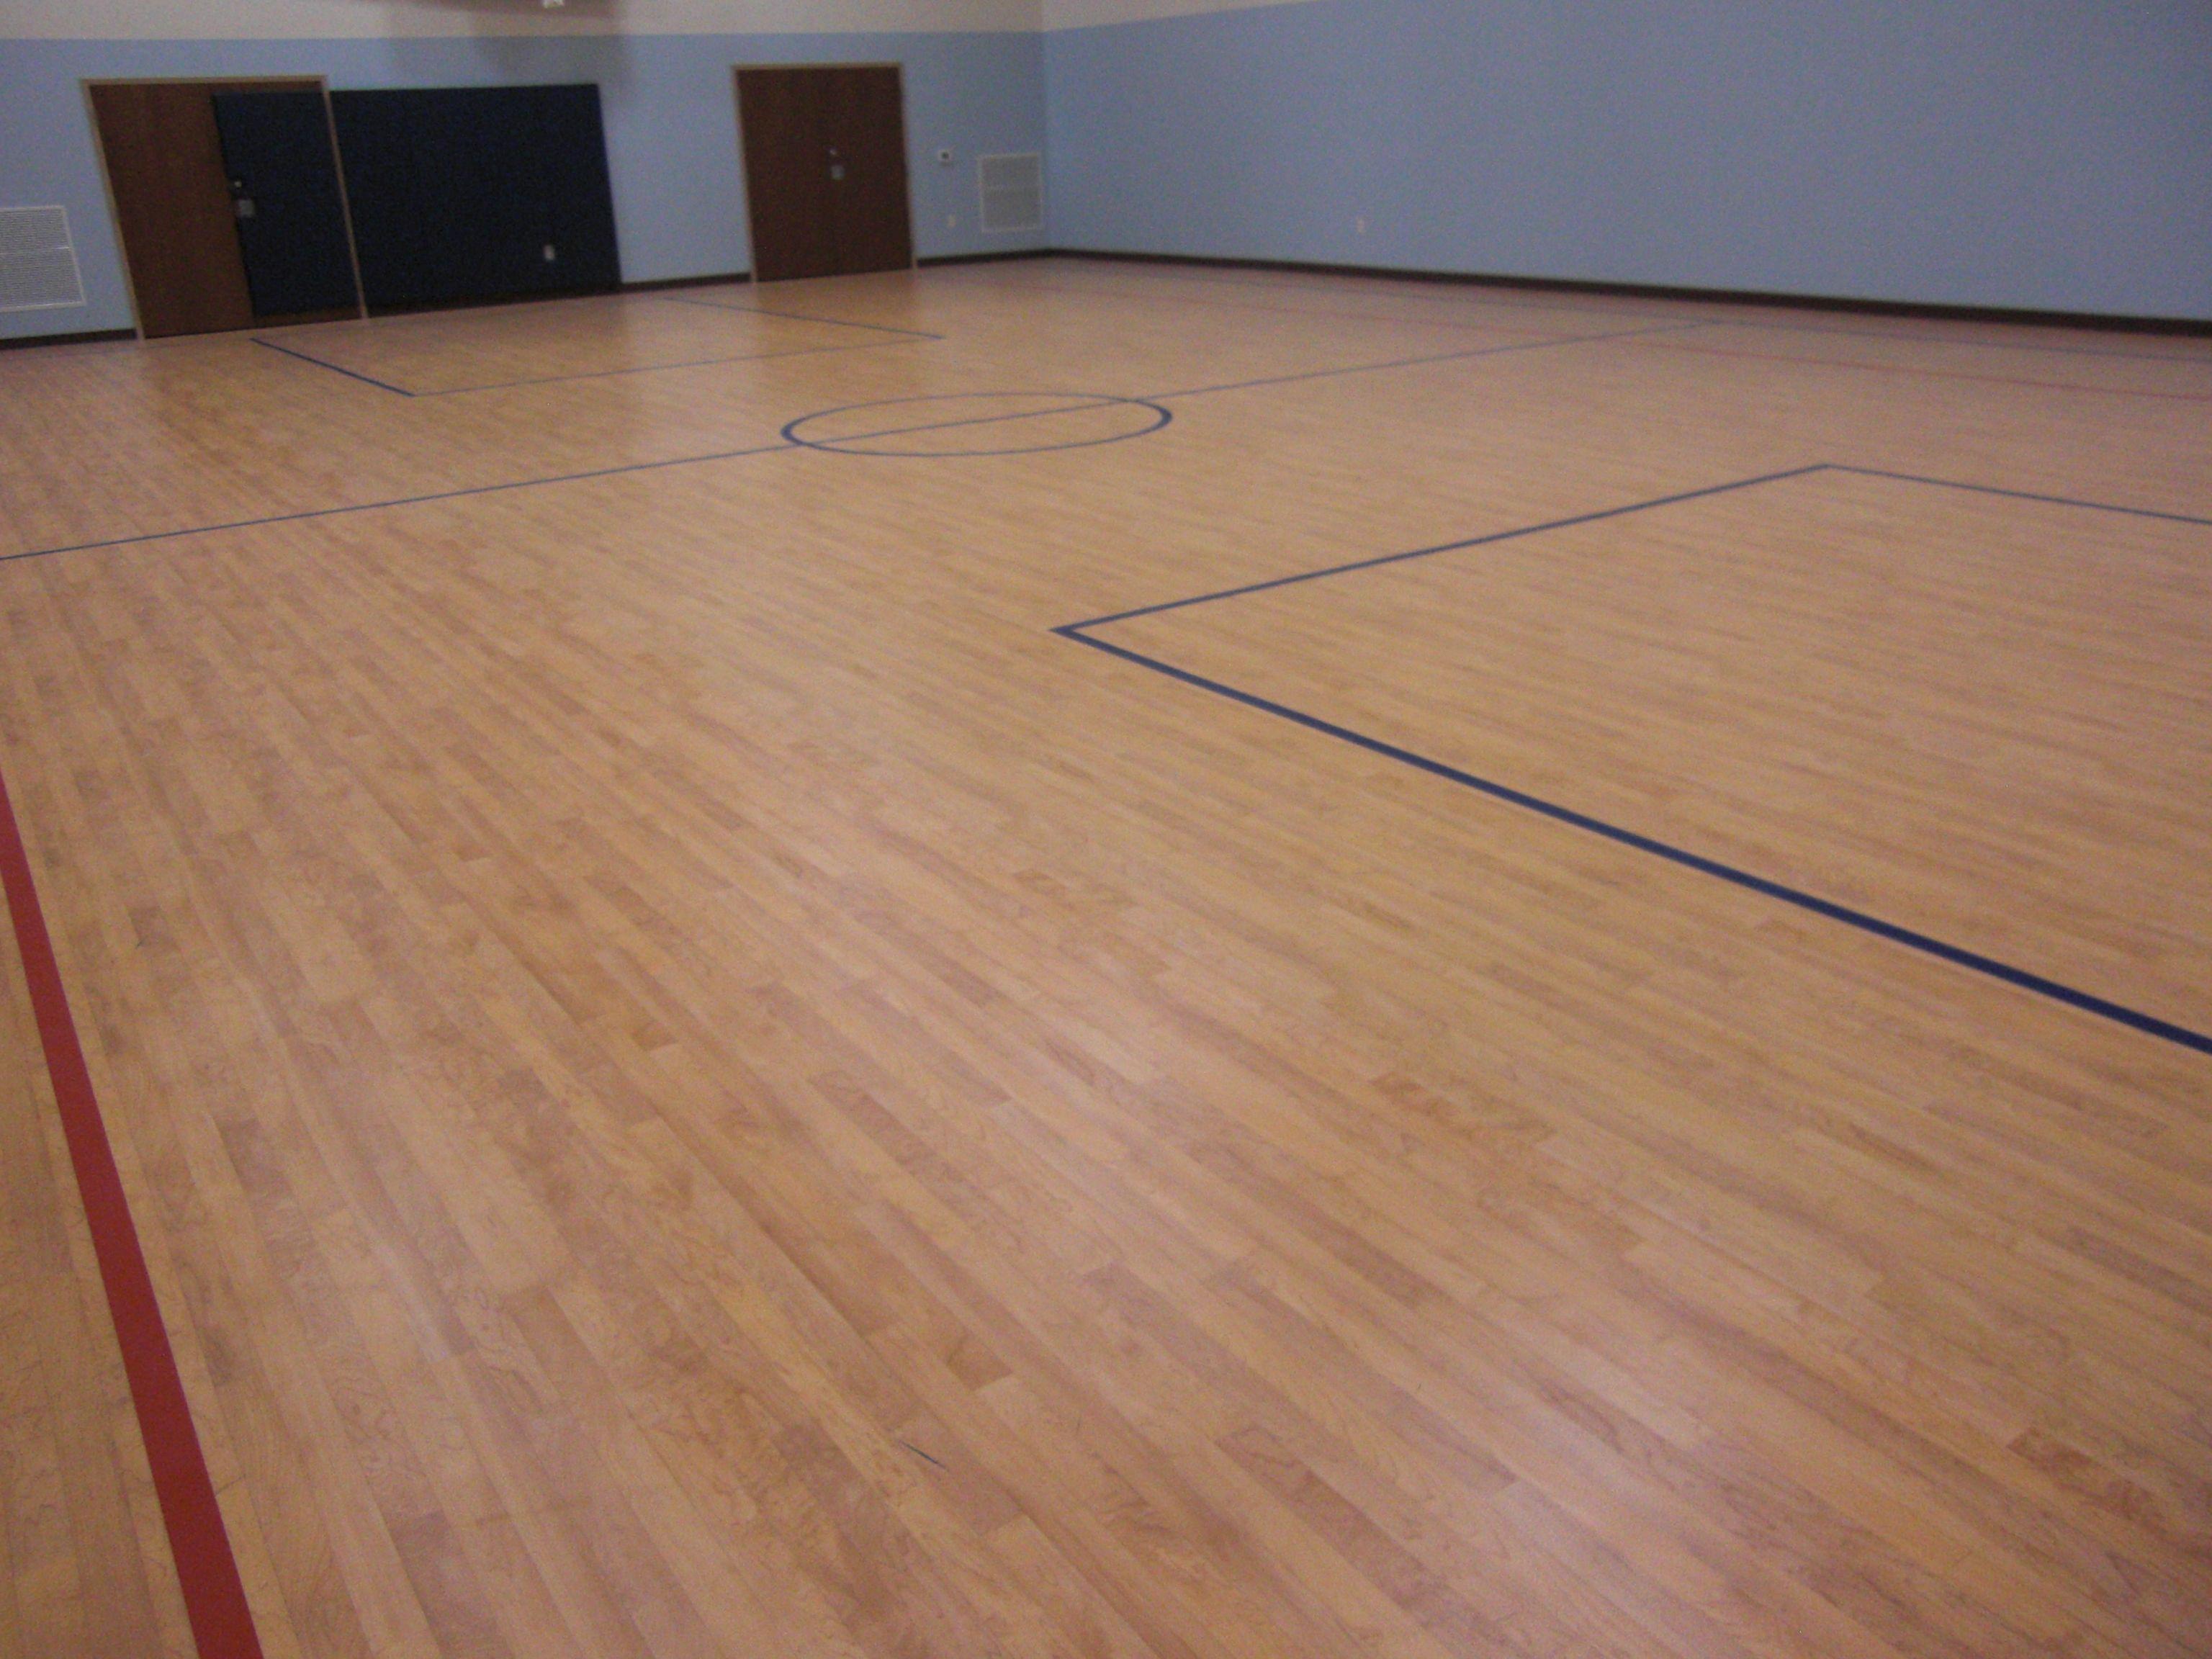 Tarkett Sports Omnisports 5 0 Used In A Multi Purpose Hall In Ephrata Pa Indoor Sports Flooring Sports